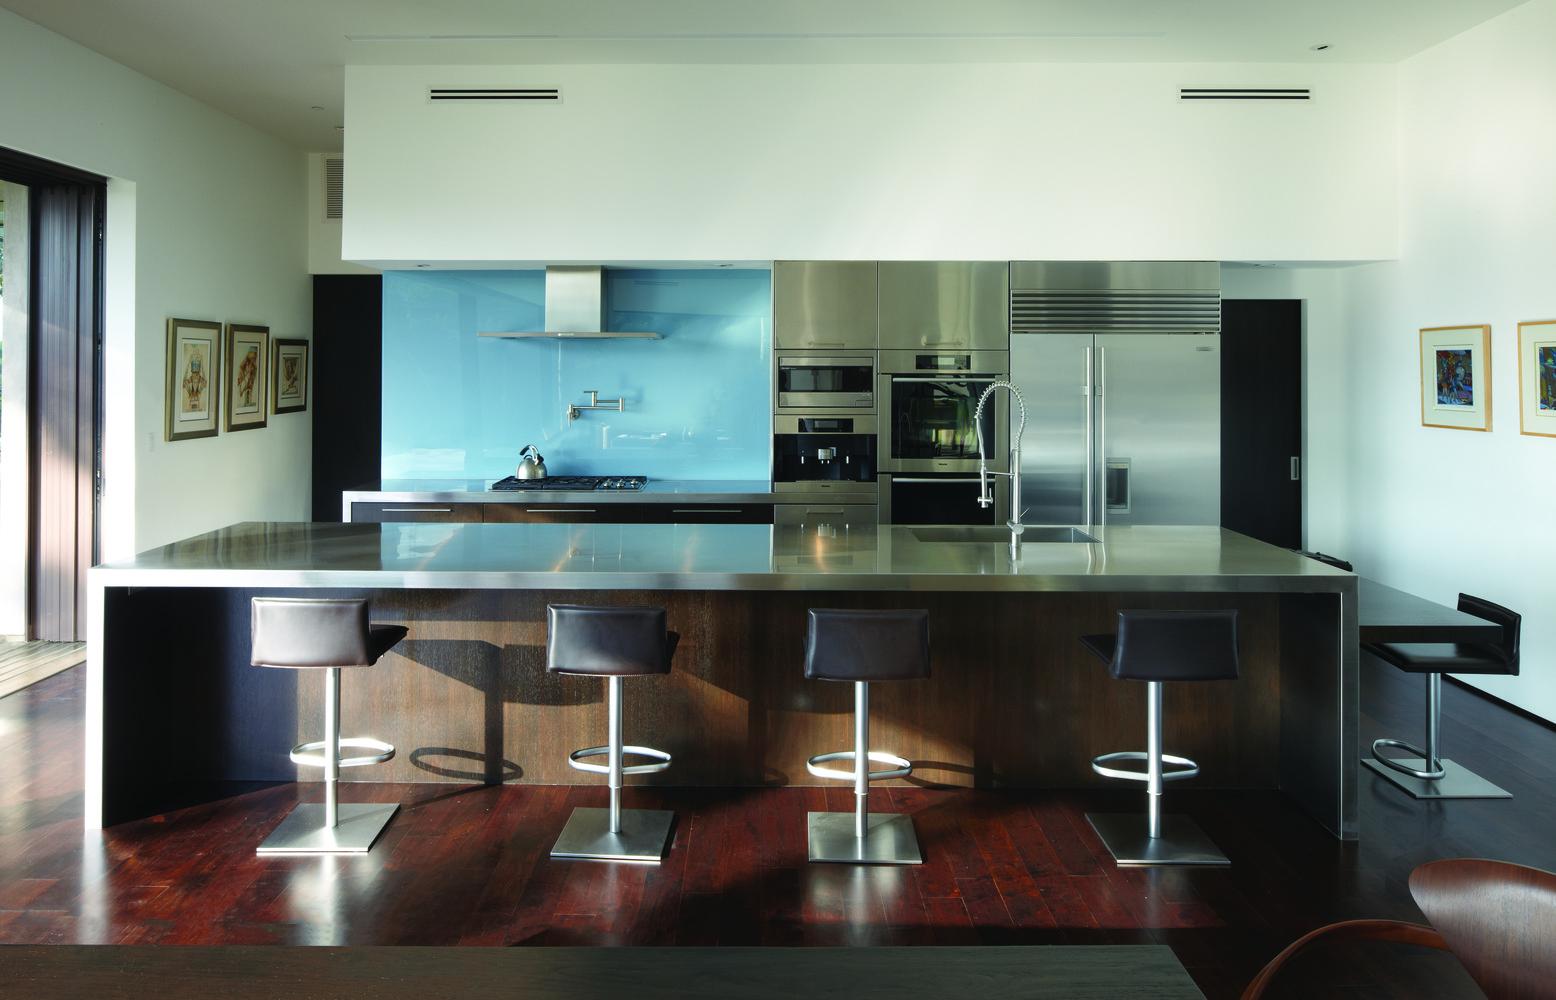 Surprising Modern Bar Tops Images - Exterior ideas 3D - gaml.us ...